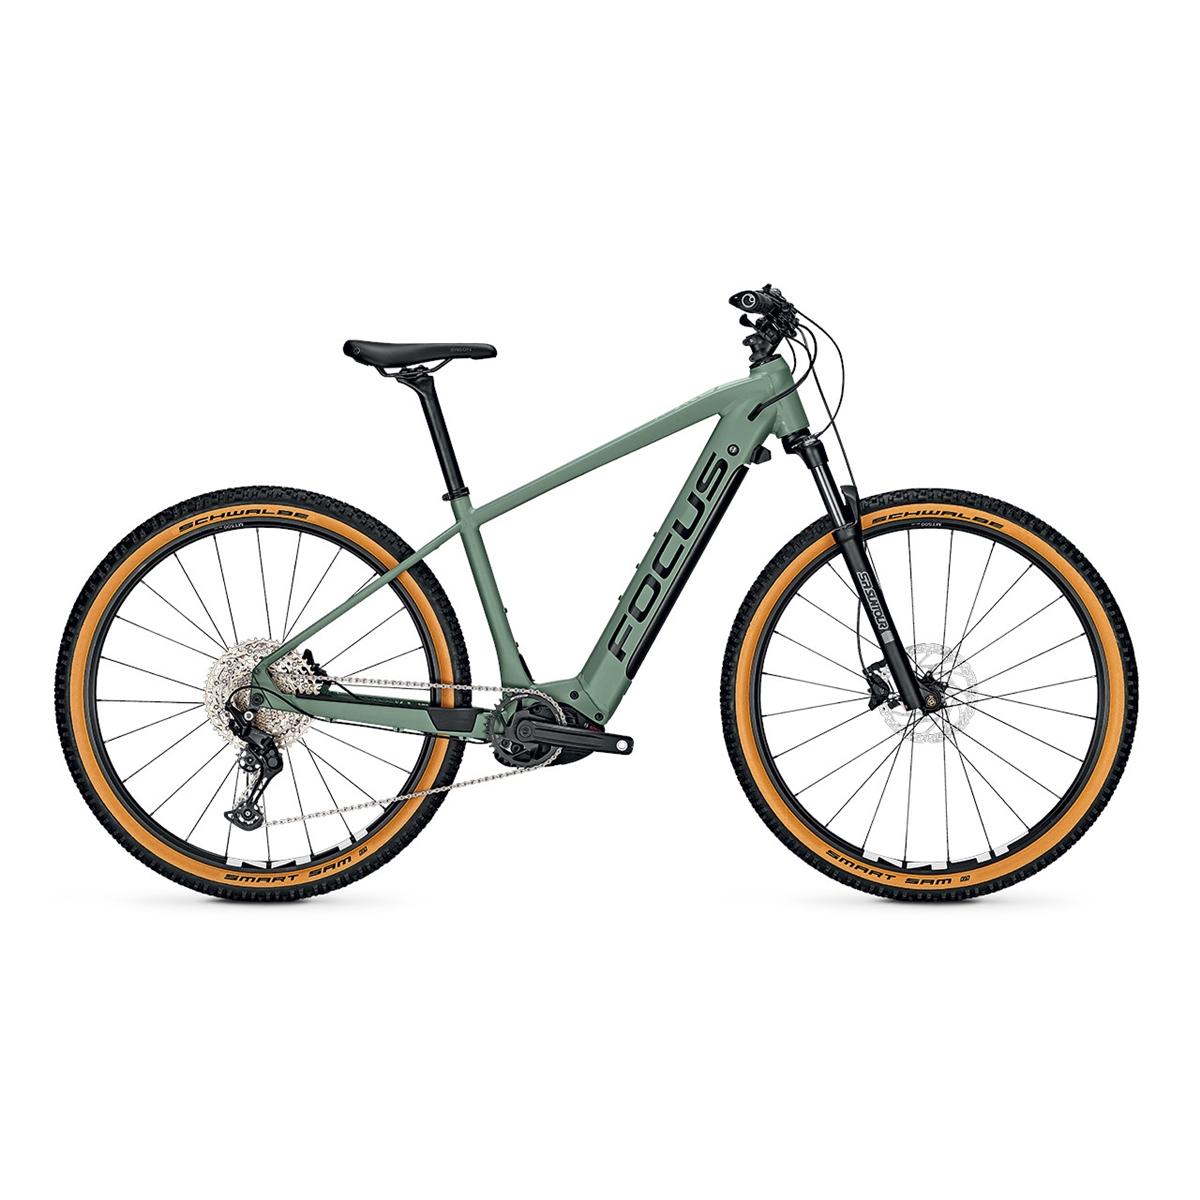 Jarifa2 6.8 Nine 29'' 100mm 11s 625Wh Bosch CX Green 2021 Size S/40